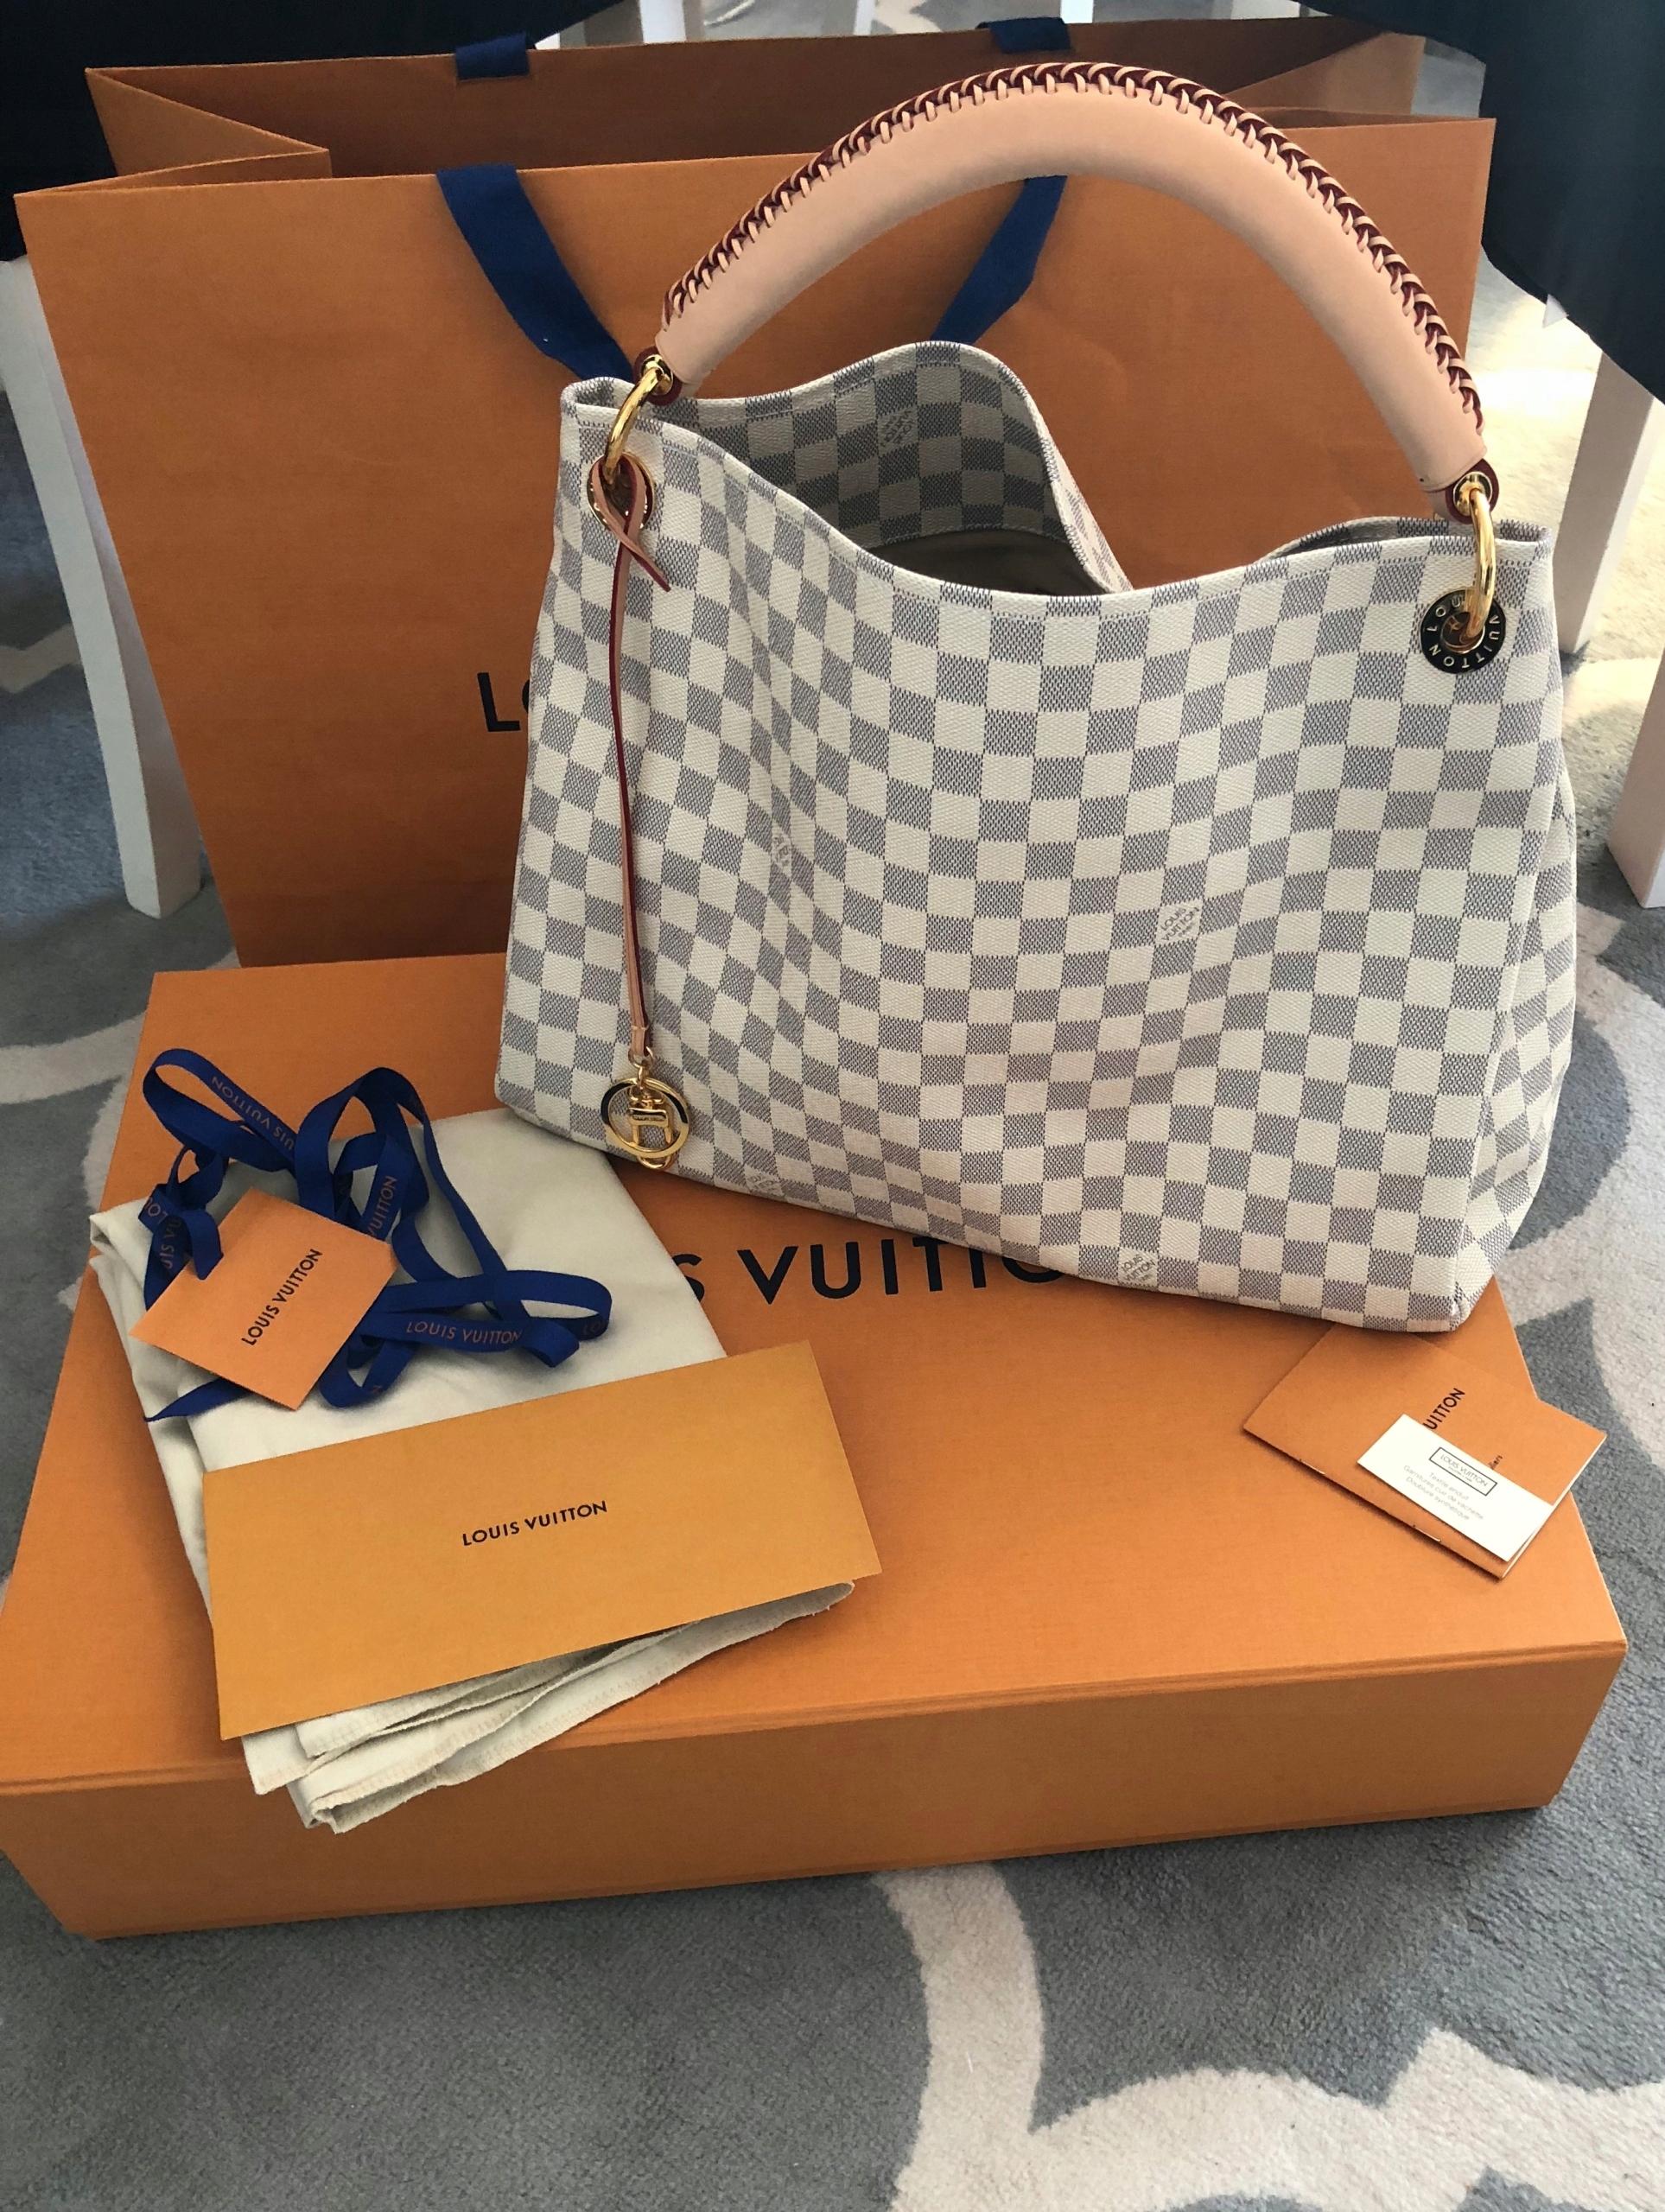 Louis Vuitton Artsy MM Dam. Azur rachunek - 7525399035 - oficjalne archiwum  allegro b17f8f41a46